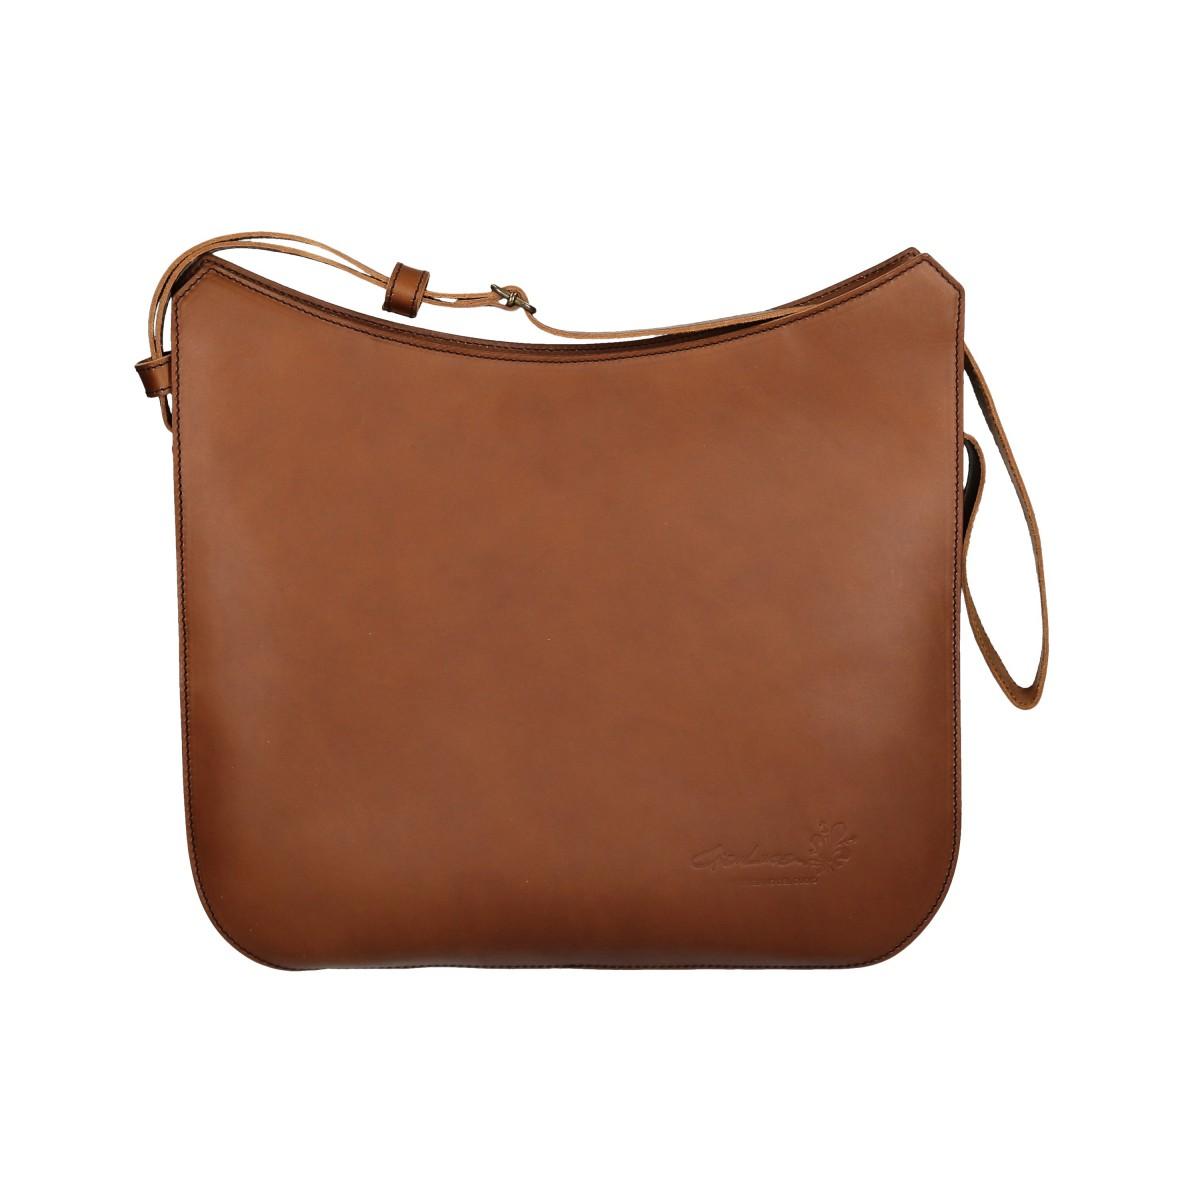 Handmade vintage leather shoulder bags long strap | Gianluca - The ...